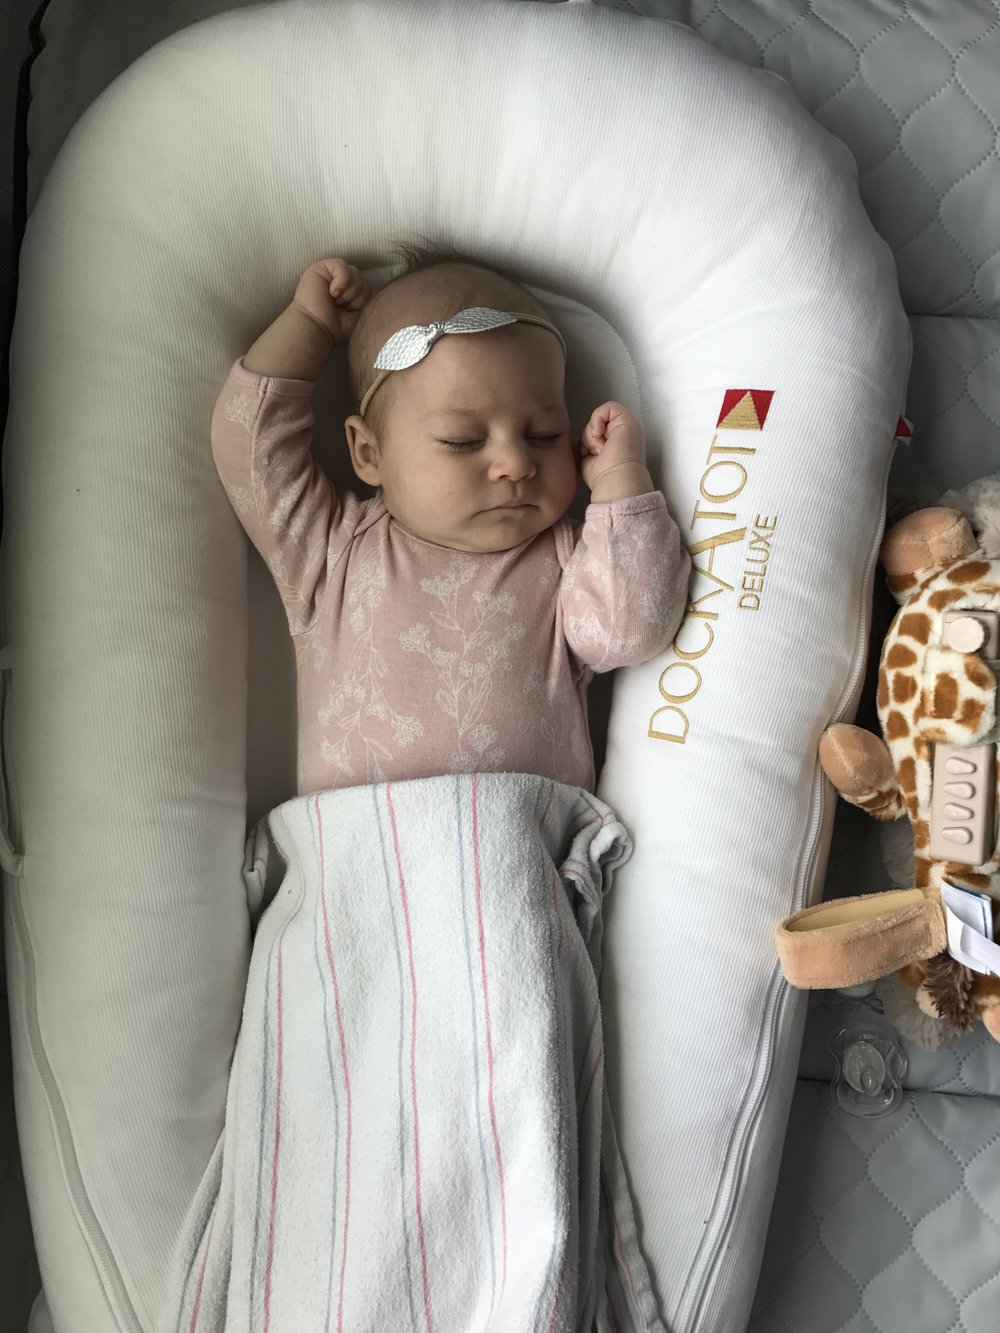 Alexa-Jean-Brown-Blake-baby